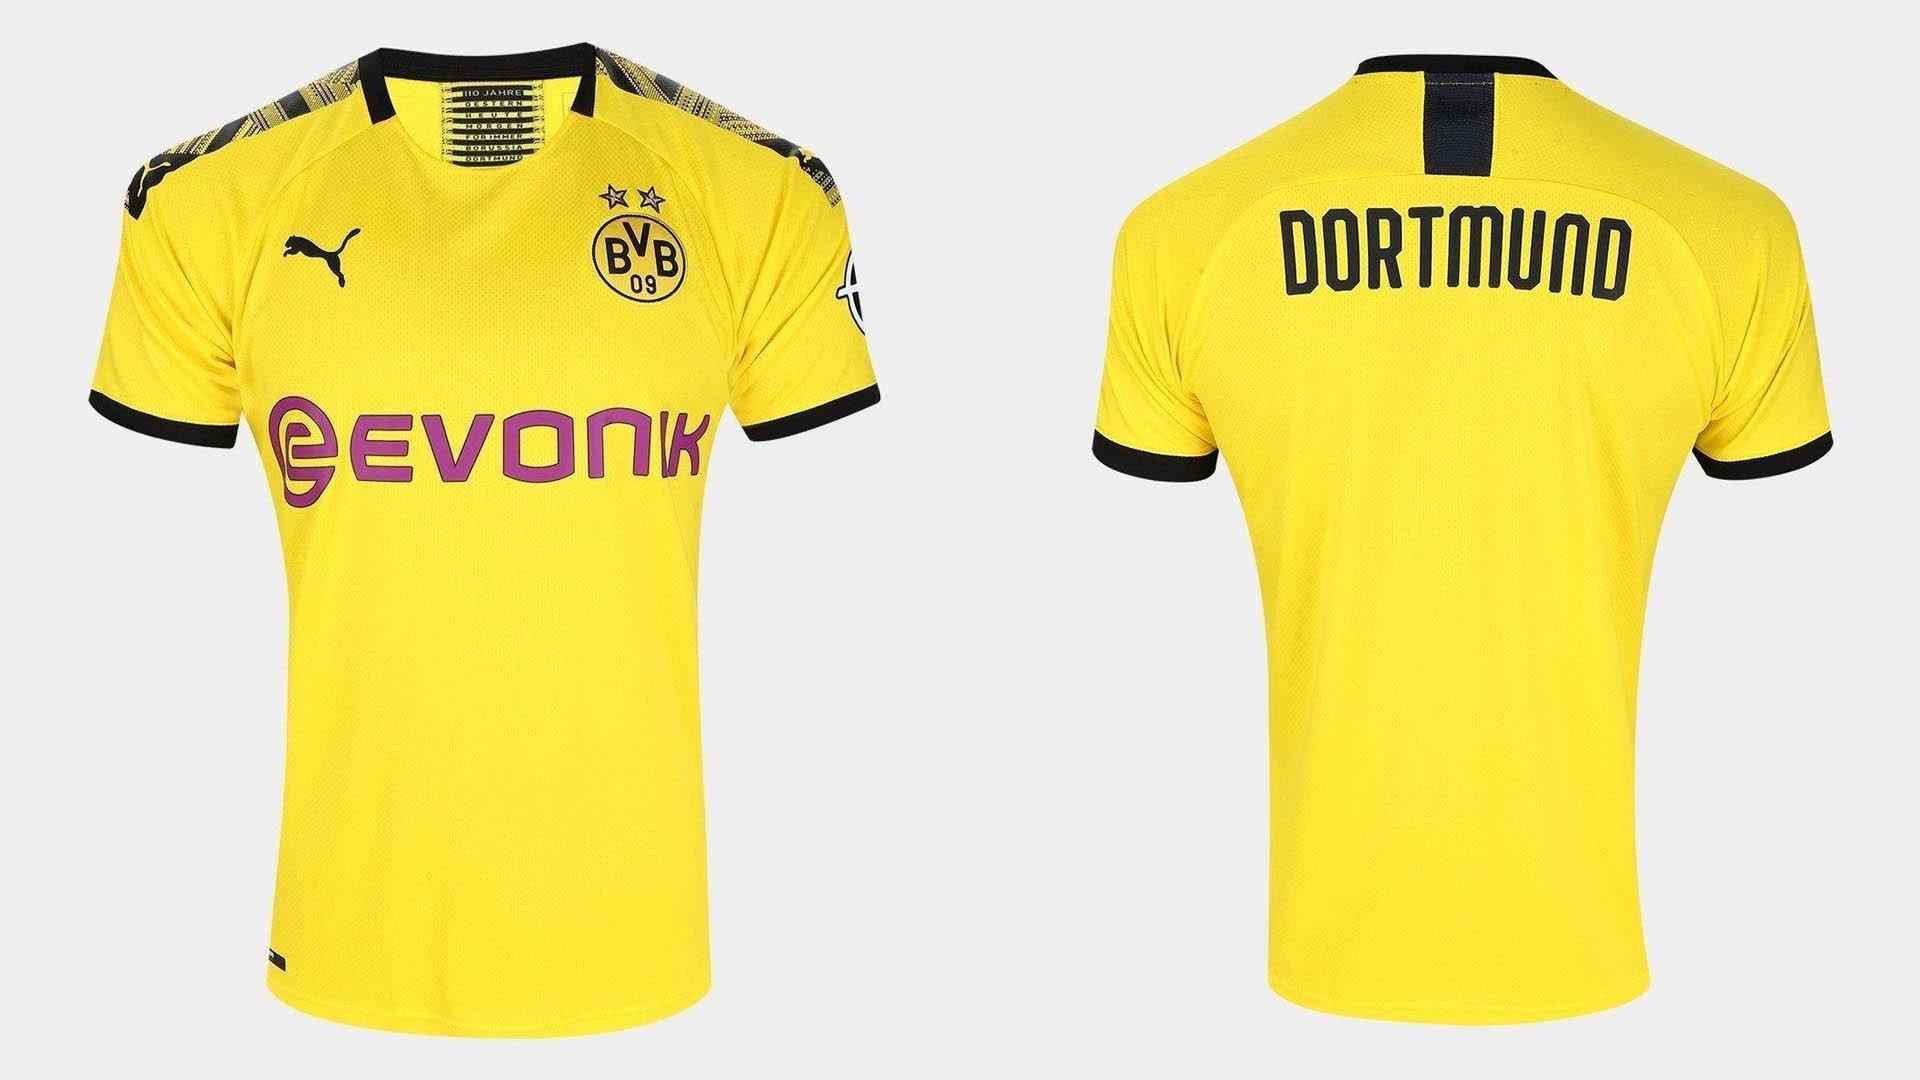 uniforme titular borussia dortmund 2019 20